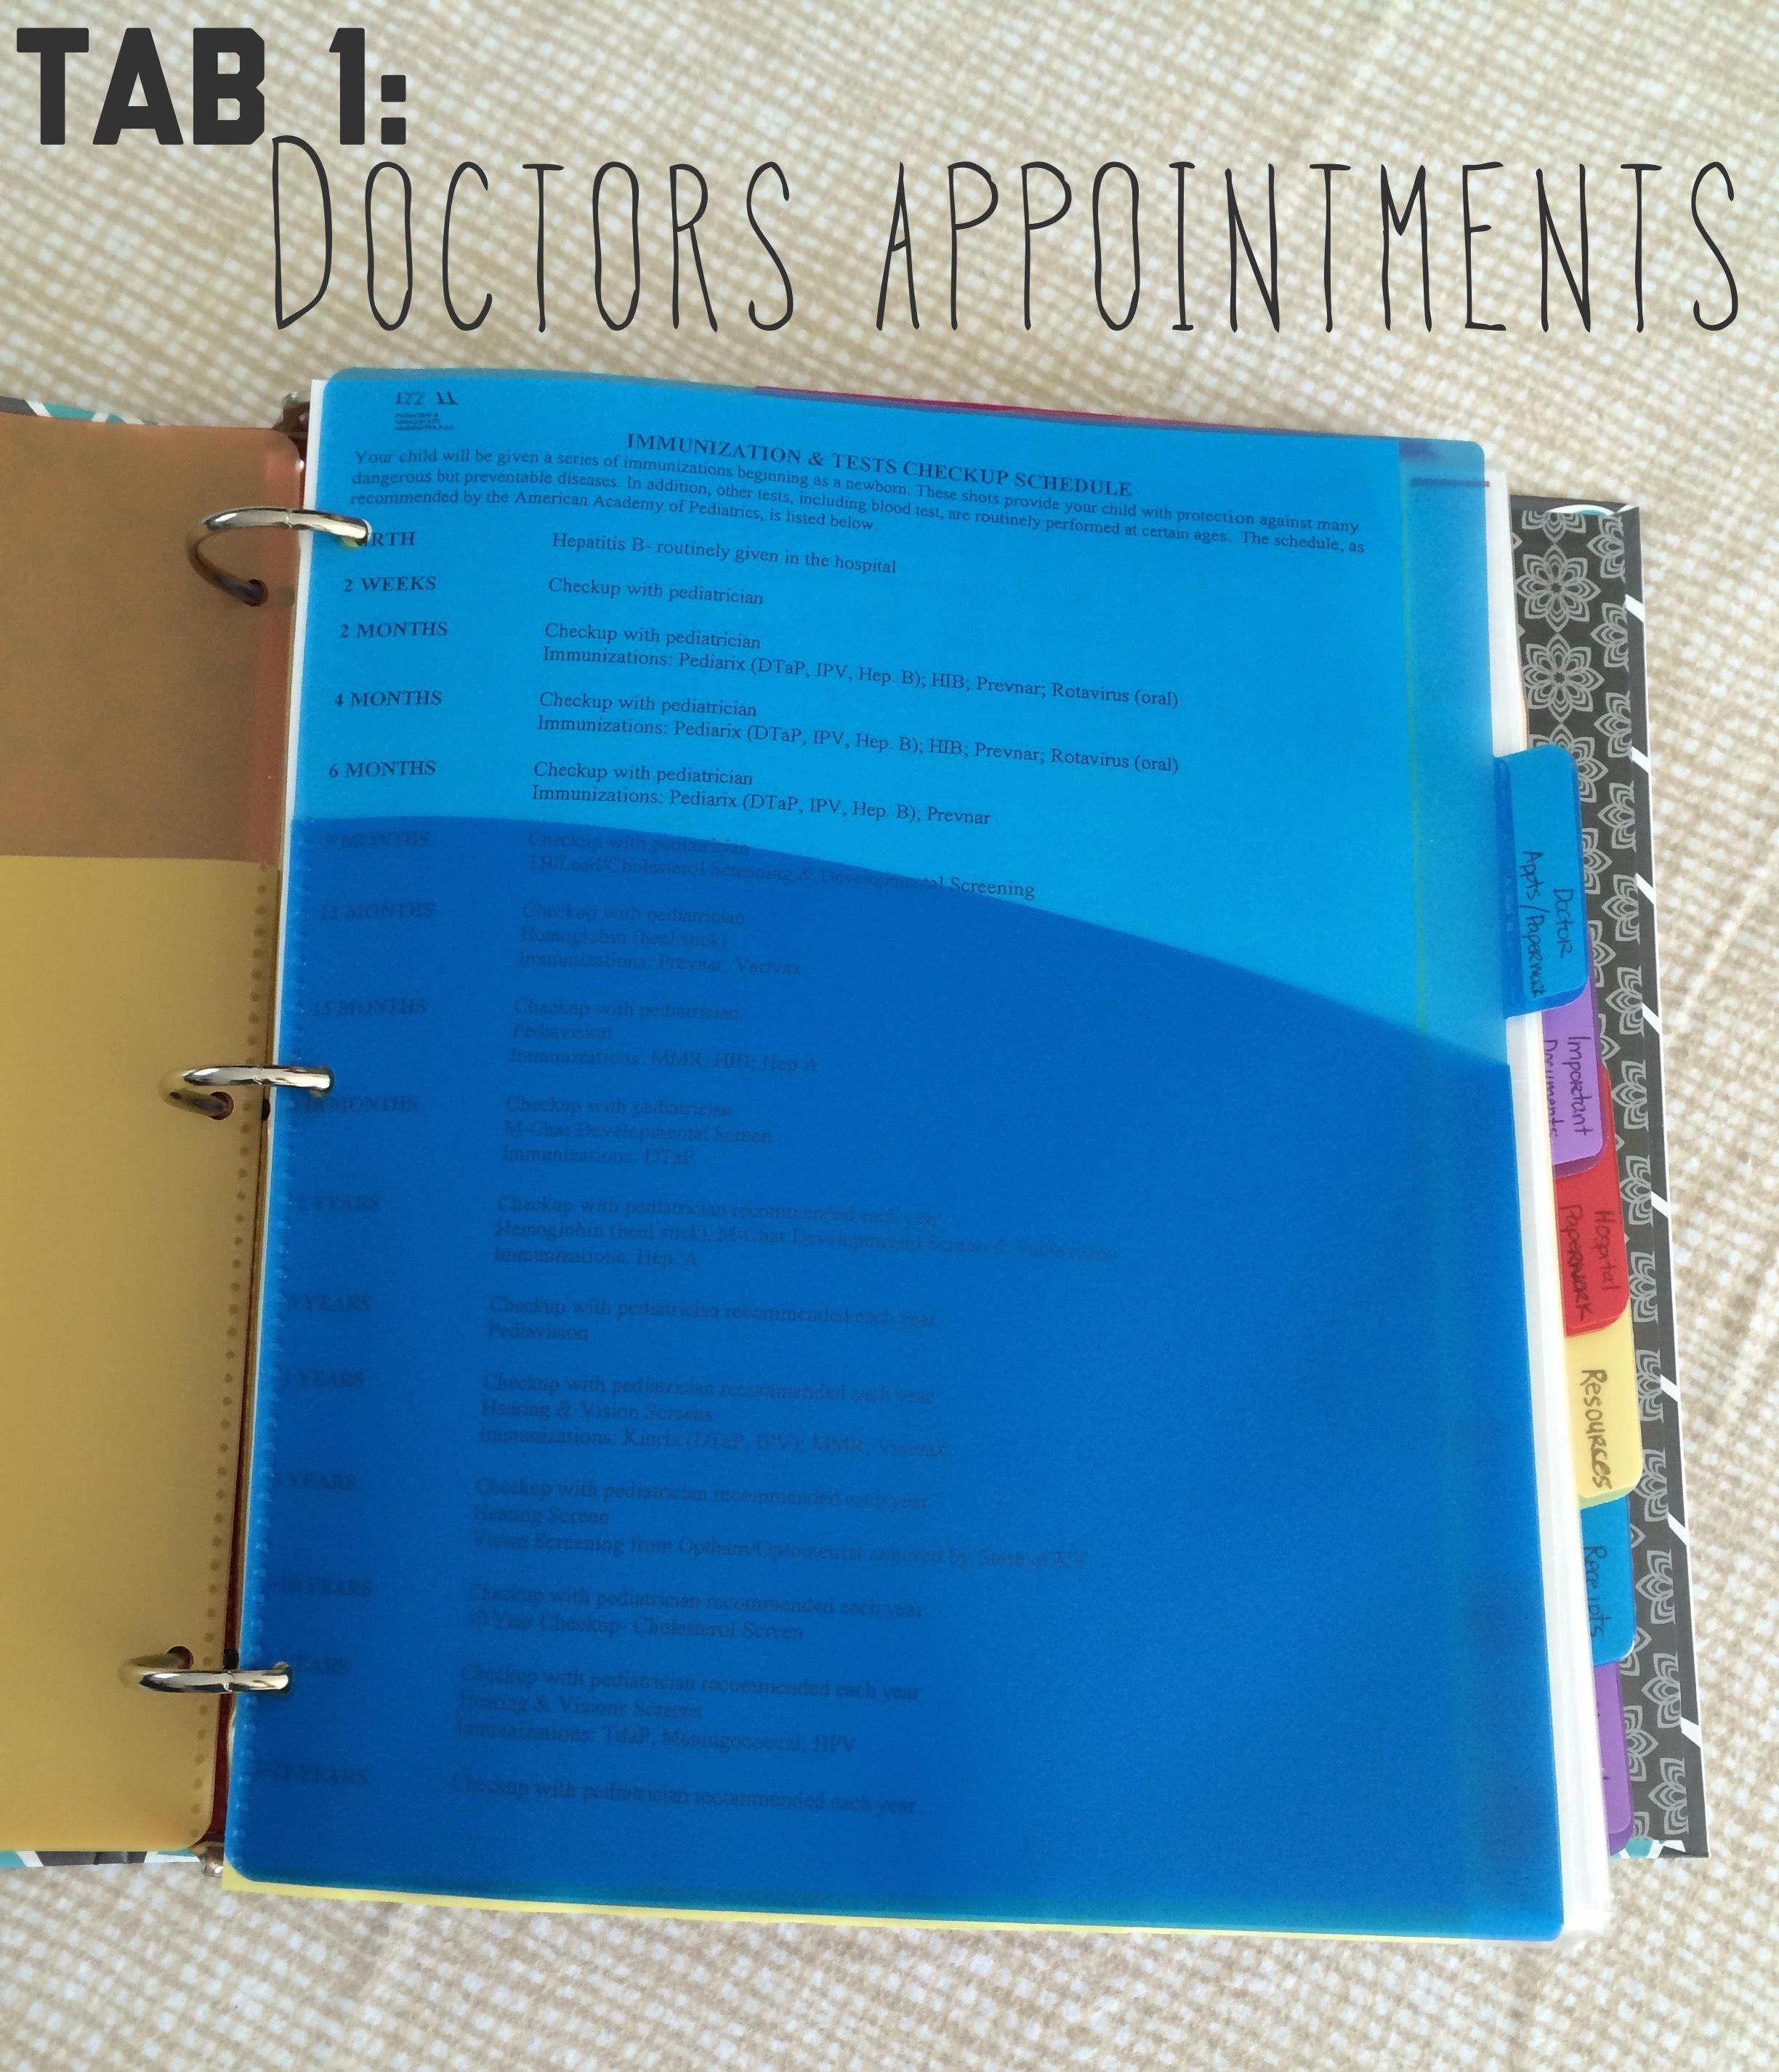 #organizational #important #documents #organize #binder #babys #baby #yourorganizational baby binder- organize your baby's important documents #BabyCareParenting #importantdocuments